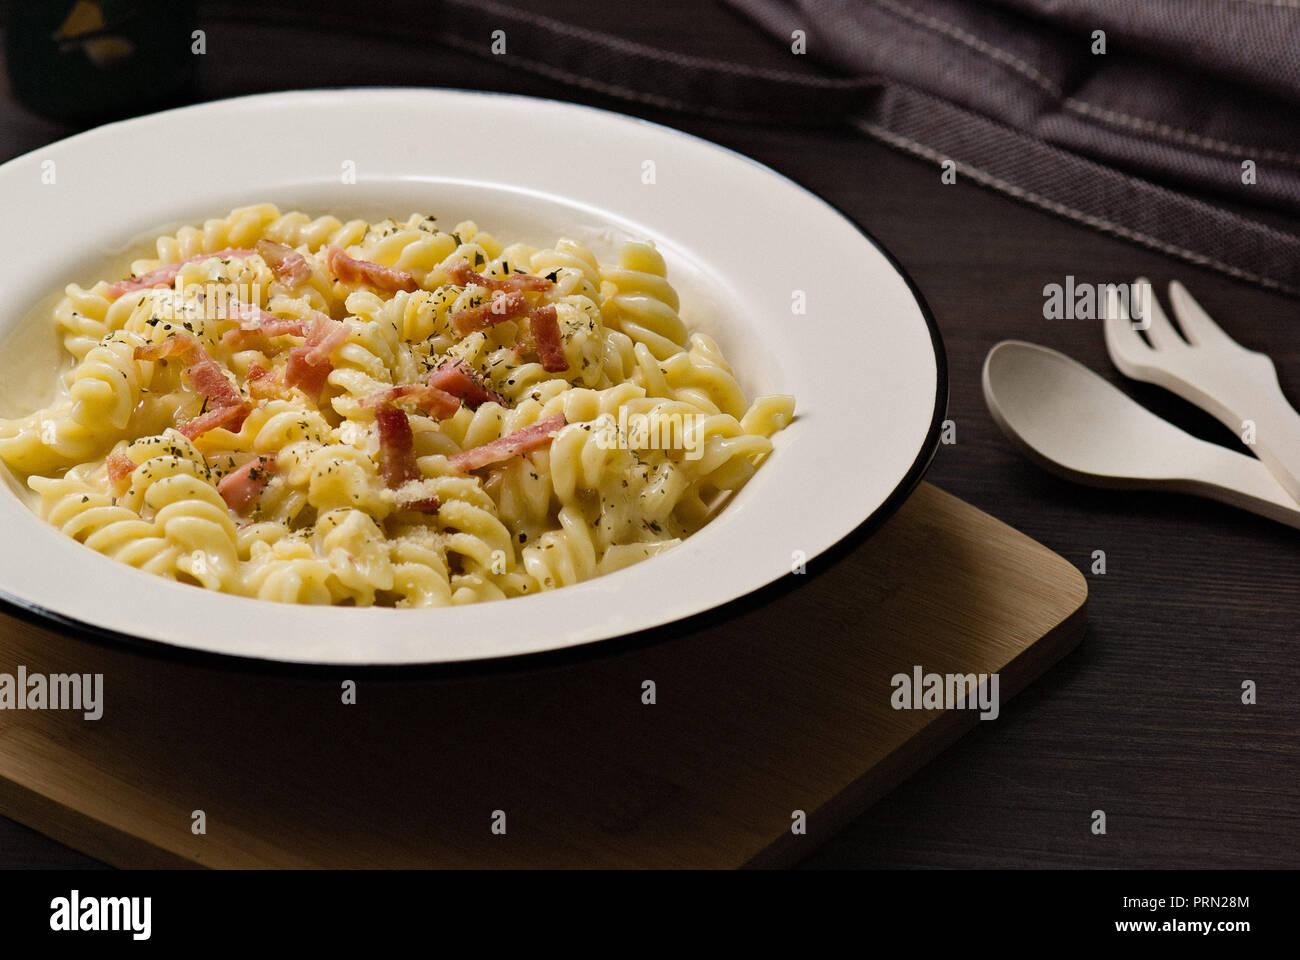 Food Spaghetti Stock Photo